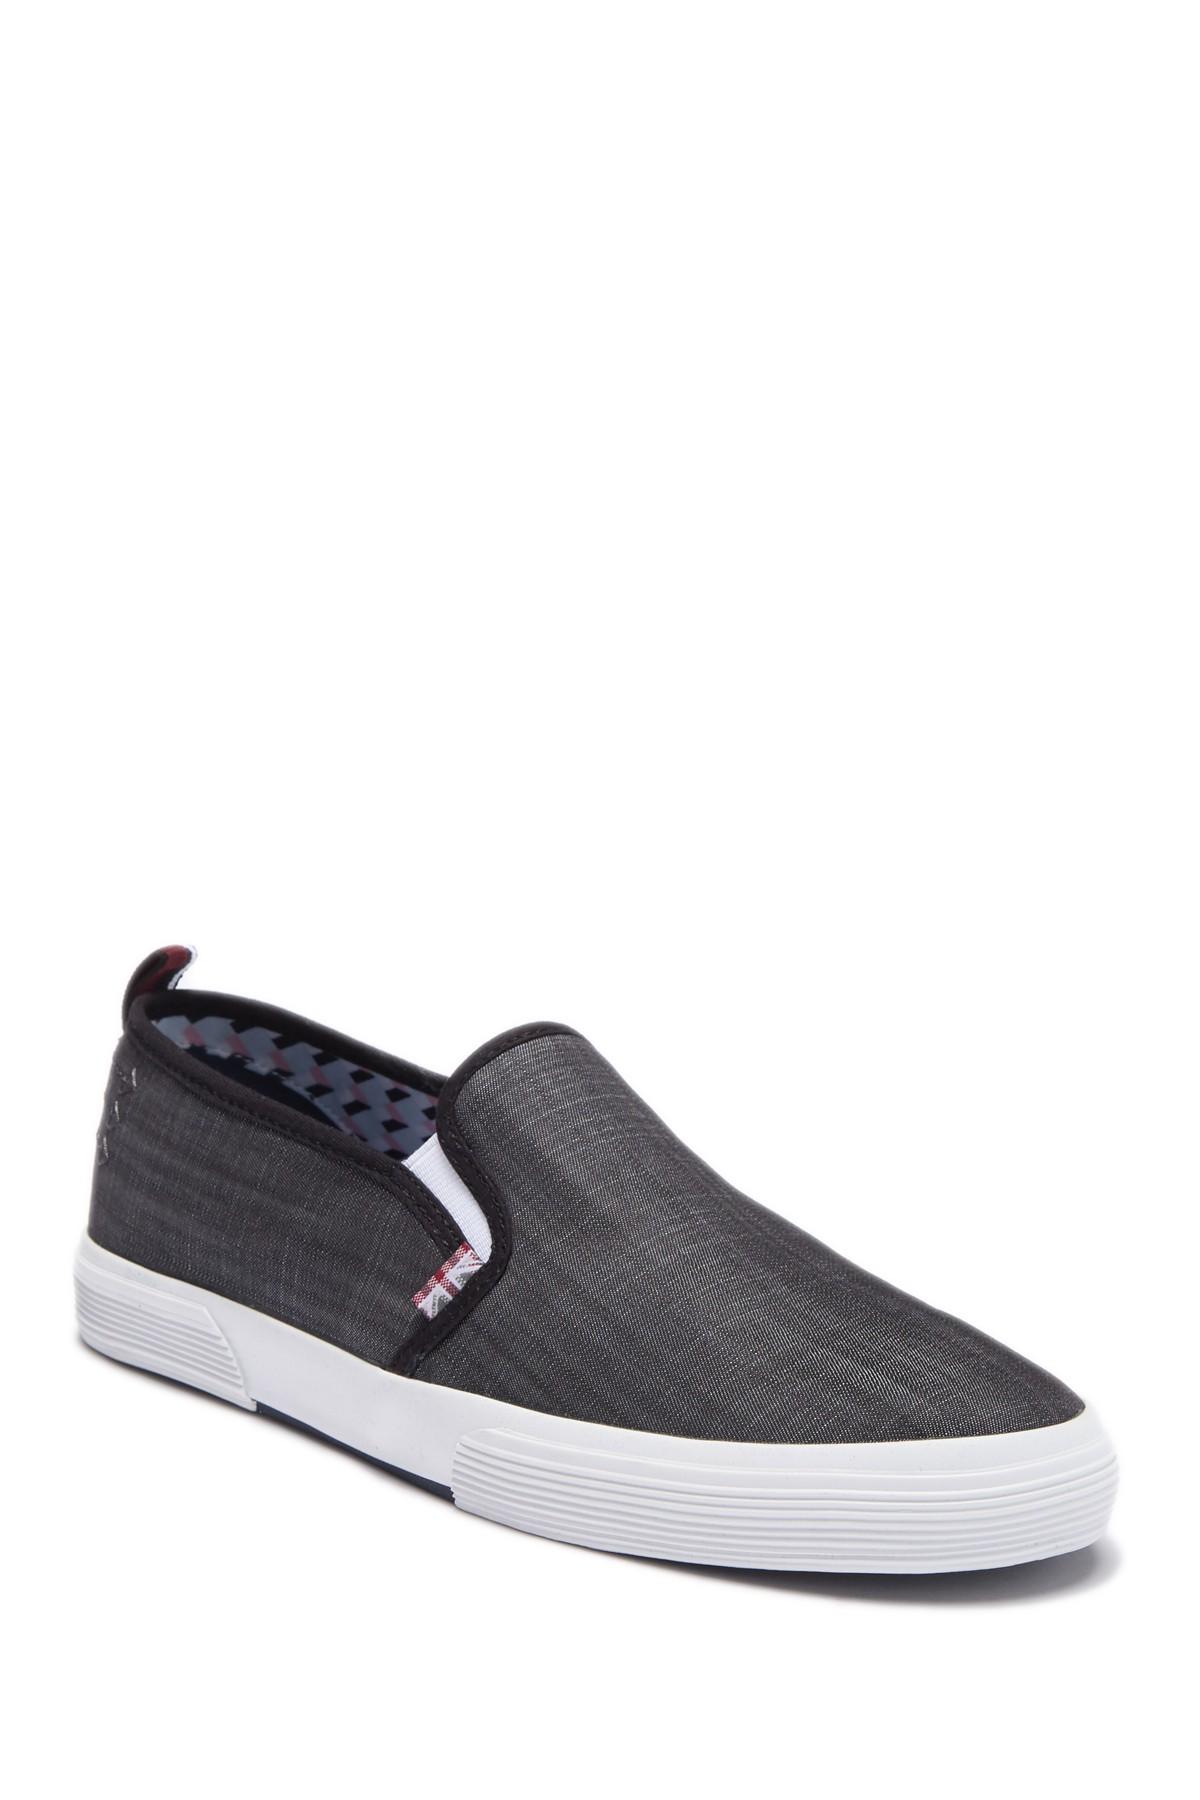 Ben Sherman - Bristol, Percy v2 Slip-On Sneakers, Conall Sneaker at Nordstrom Rack $25 + FS on orders of $100+